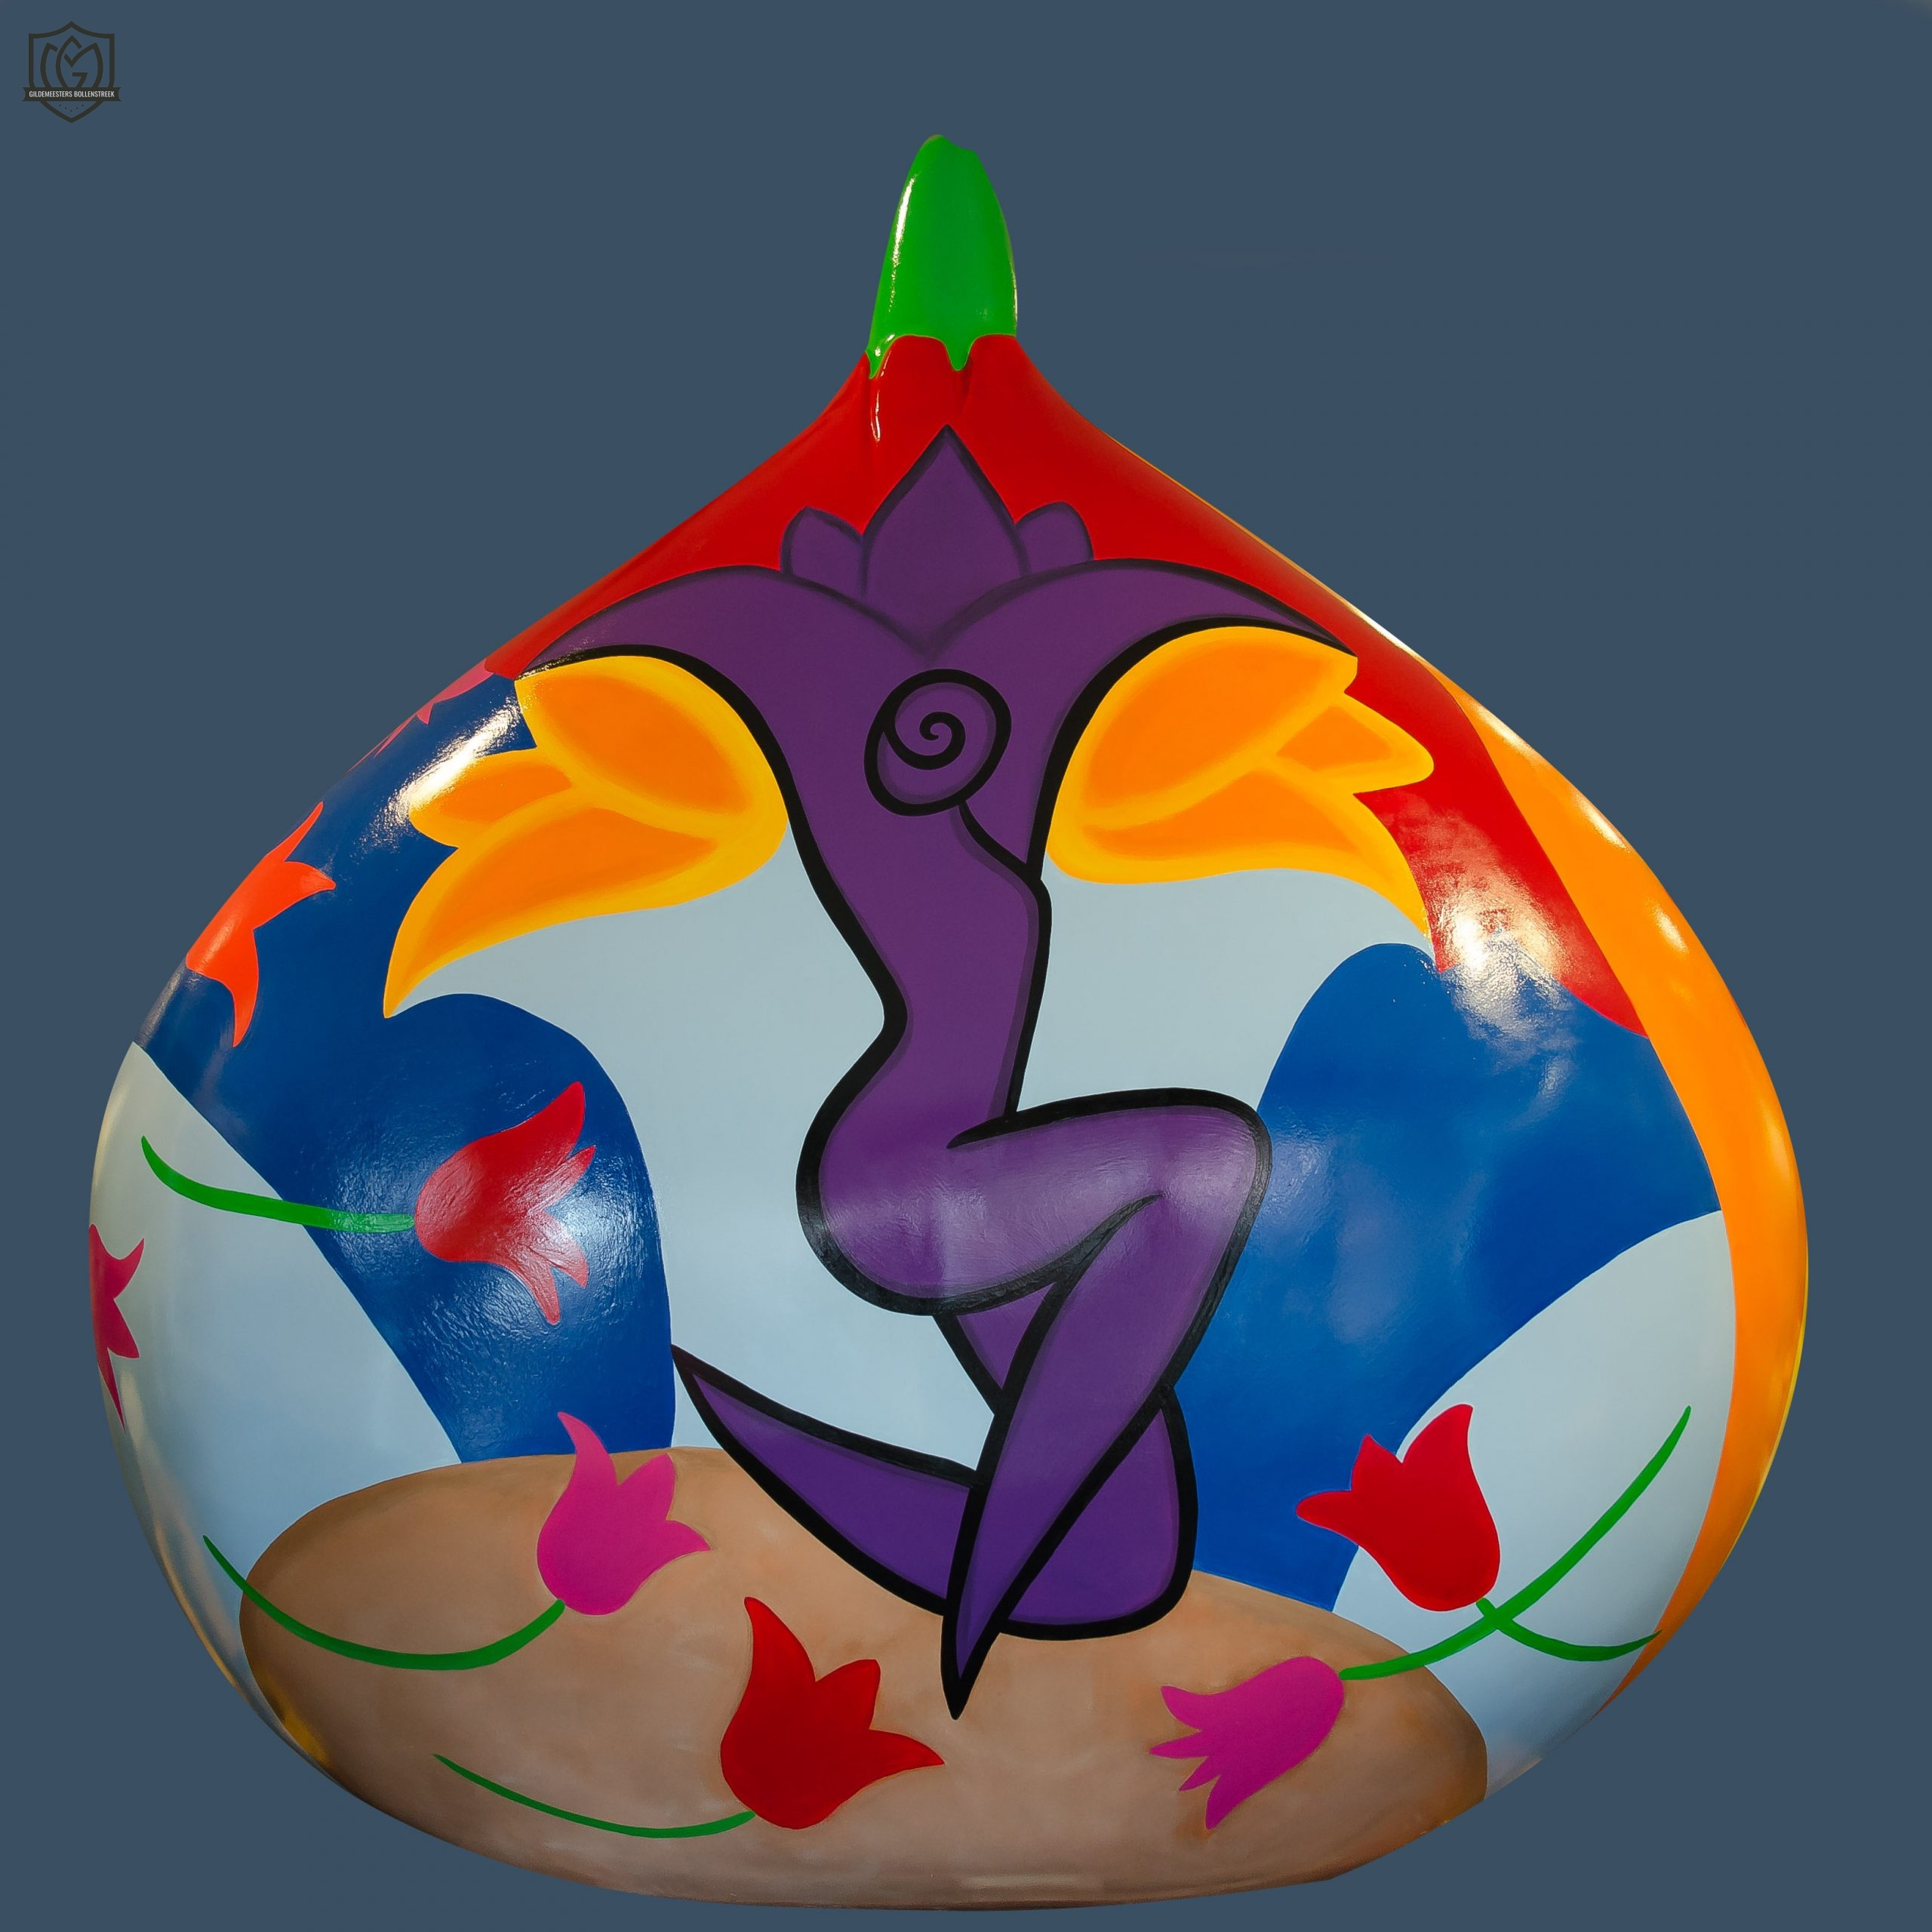 Reuzenbol 'spring spectucular' - donna corbani